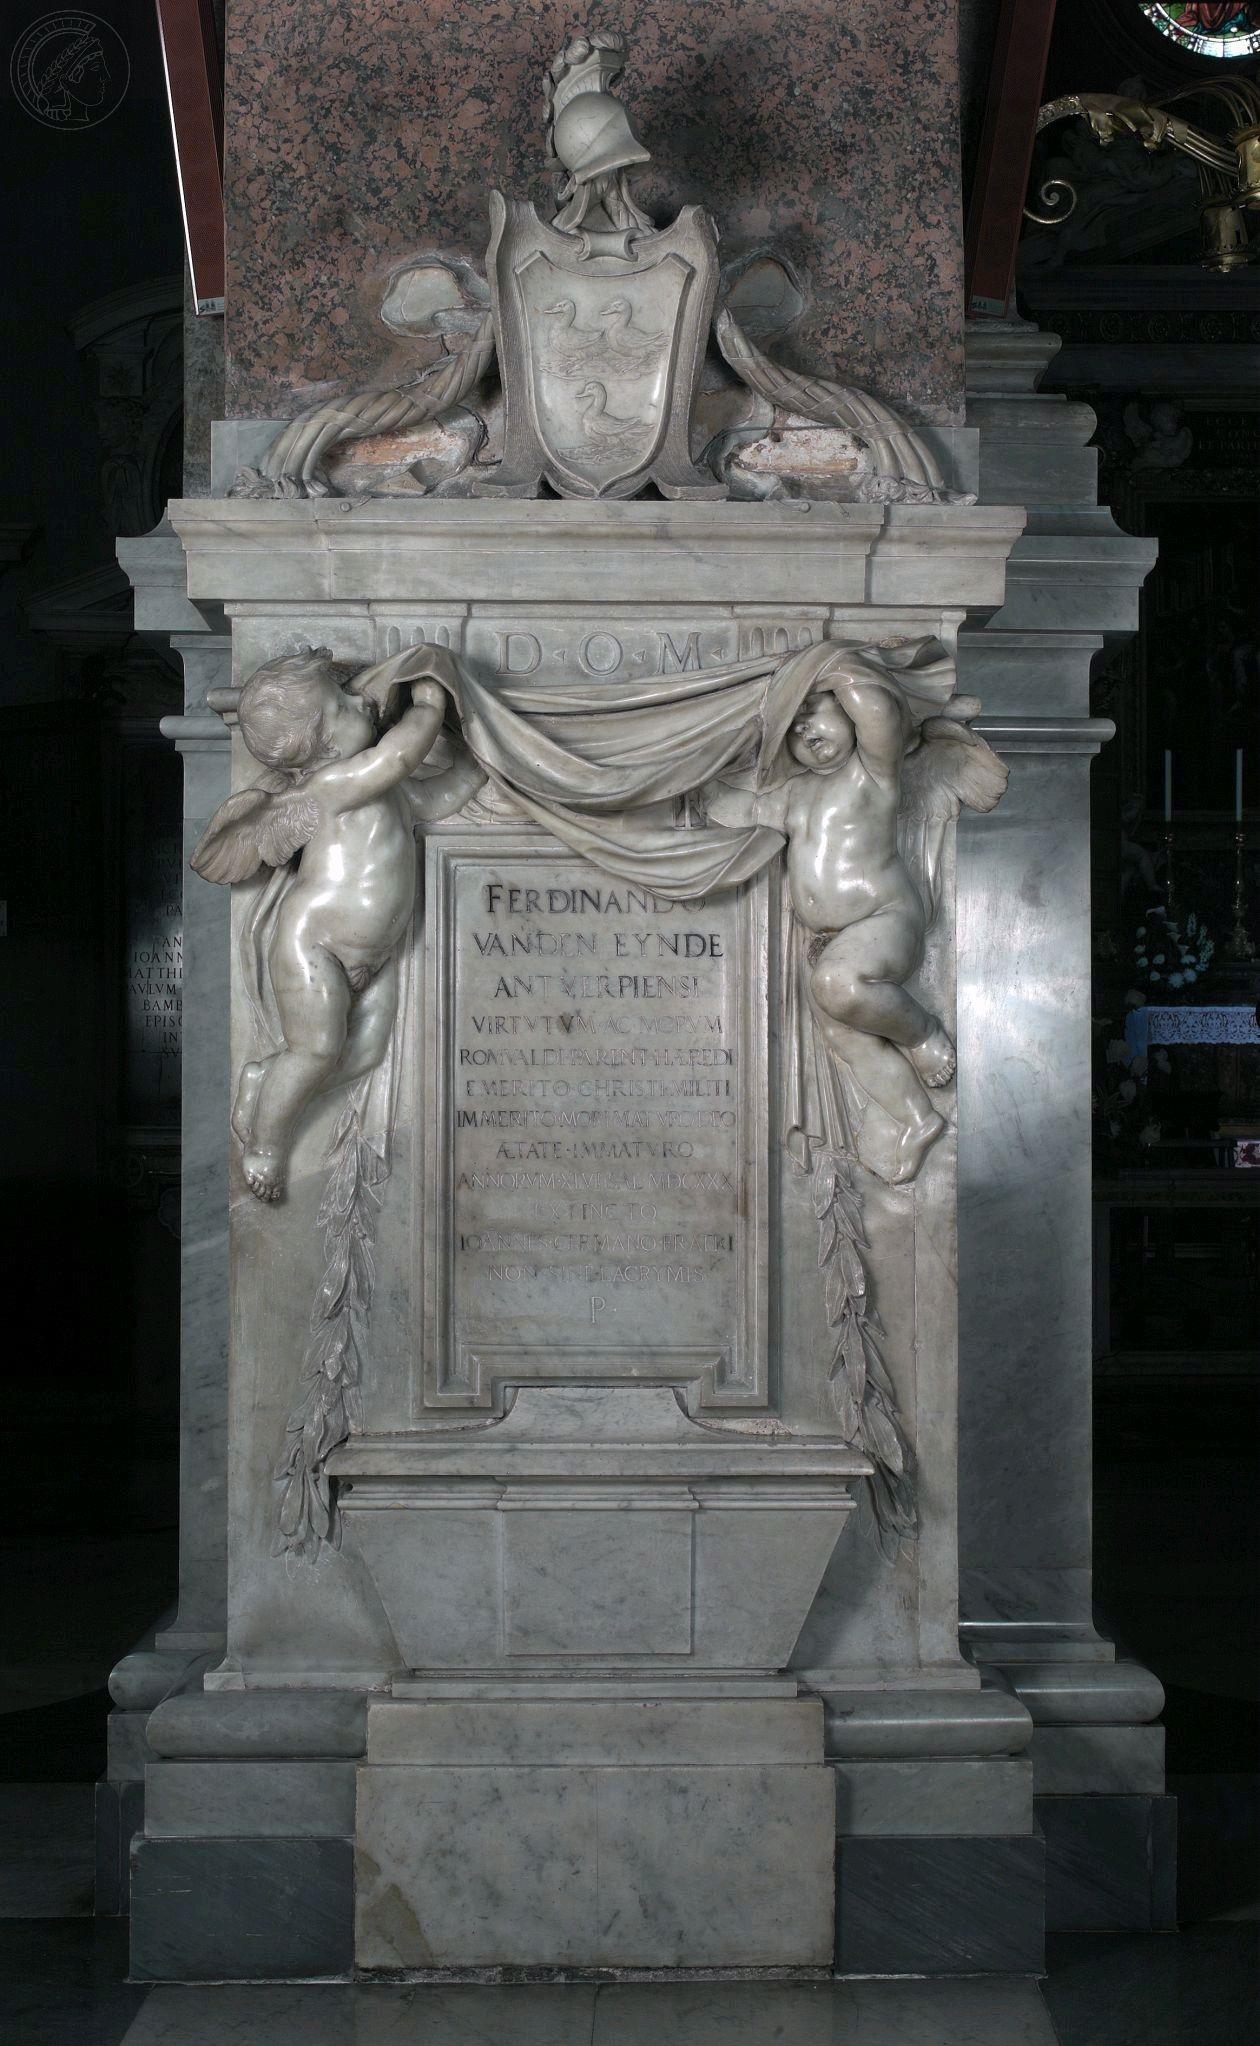 Epitafium Ferdinanda van den Eynde w kościele Santa Maria dell'Anima